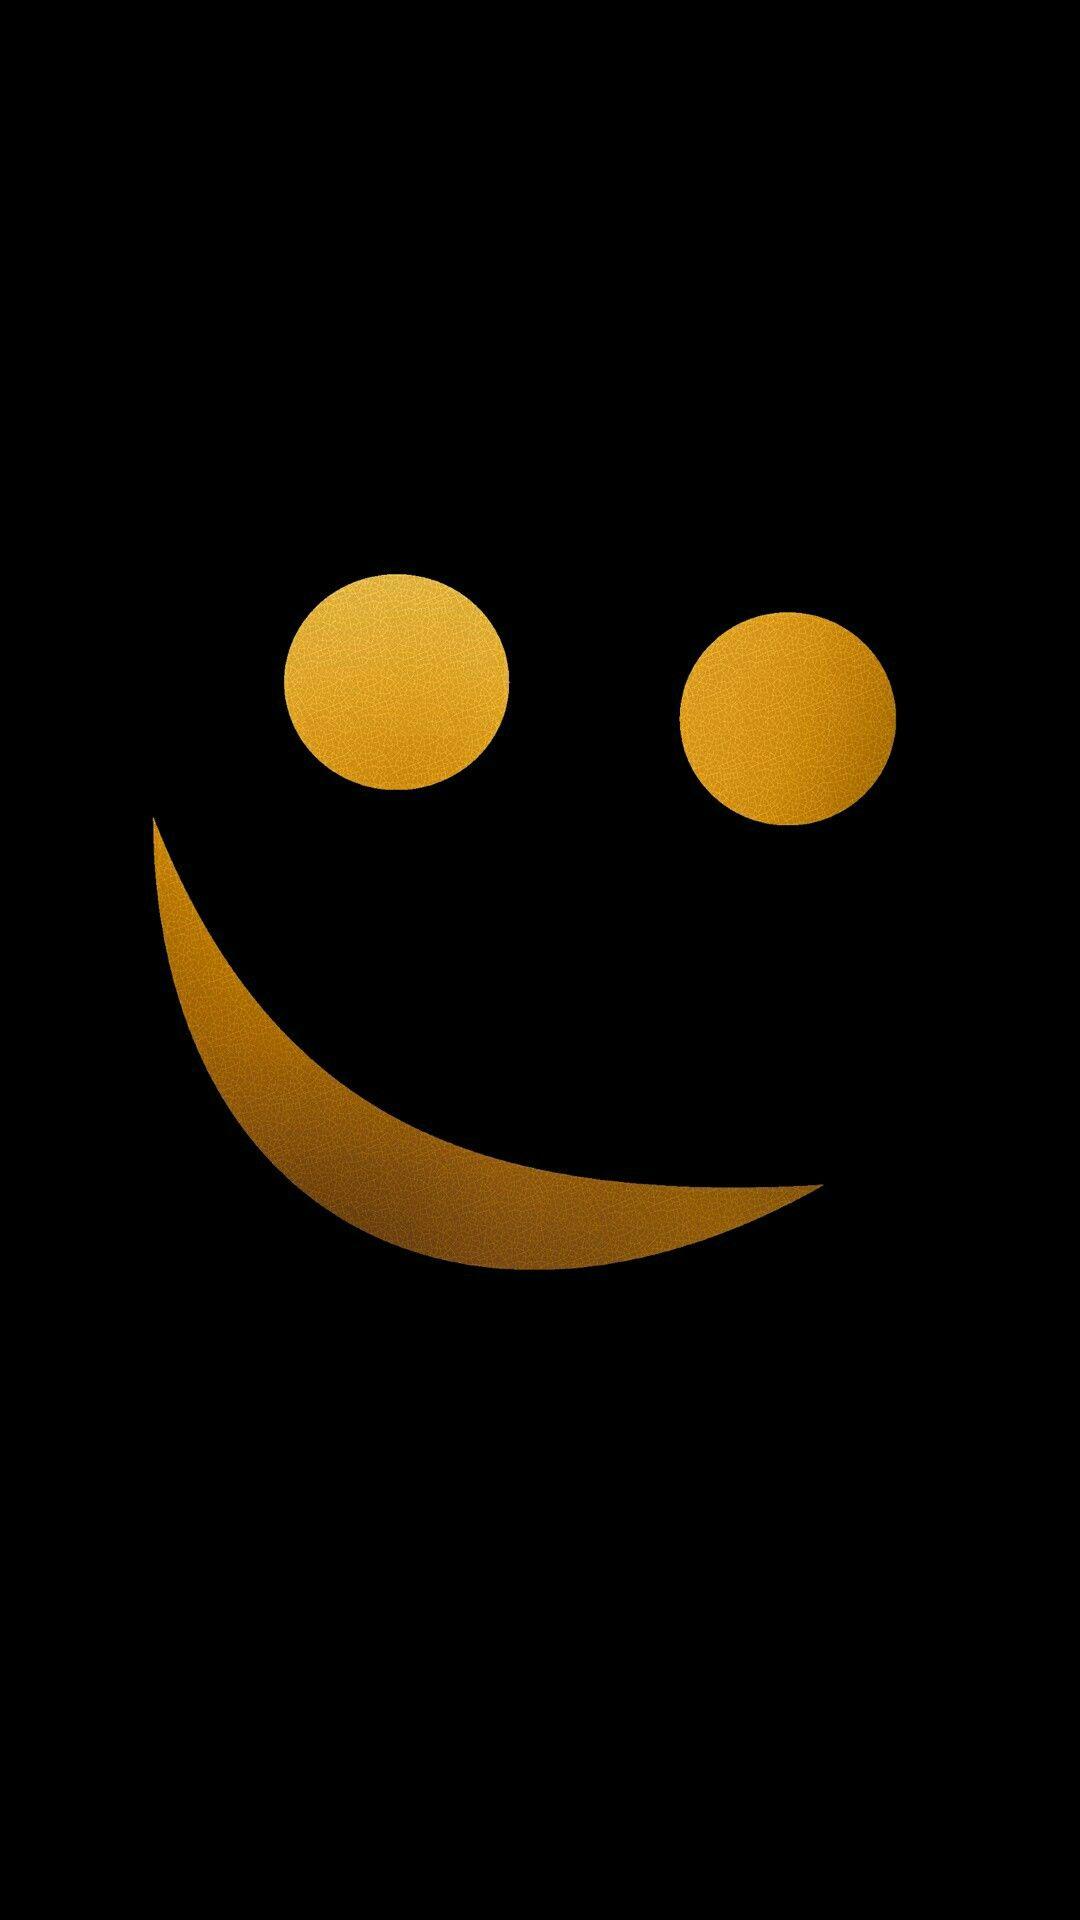 Smiley :) | Iphone wallpaper tumblr aesthetic, Smile wallpaper